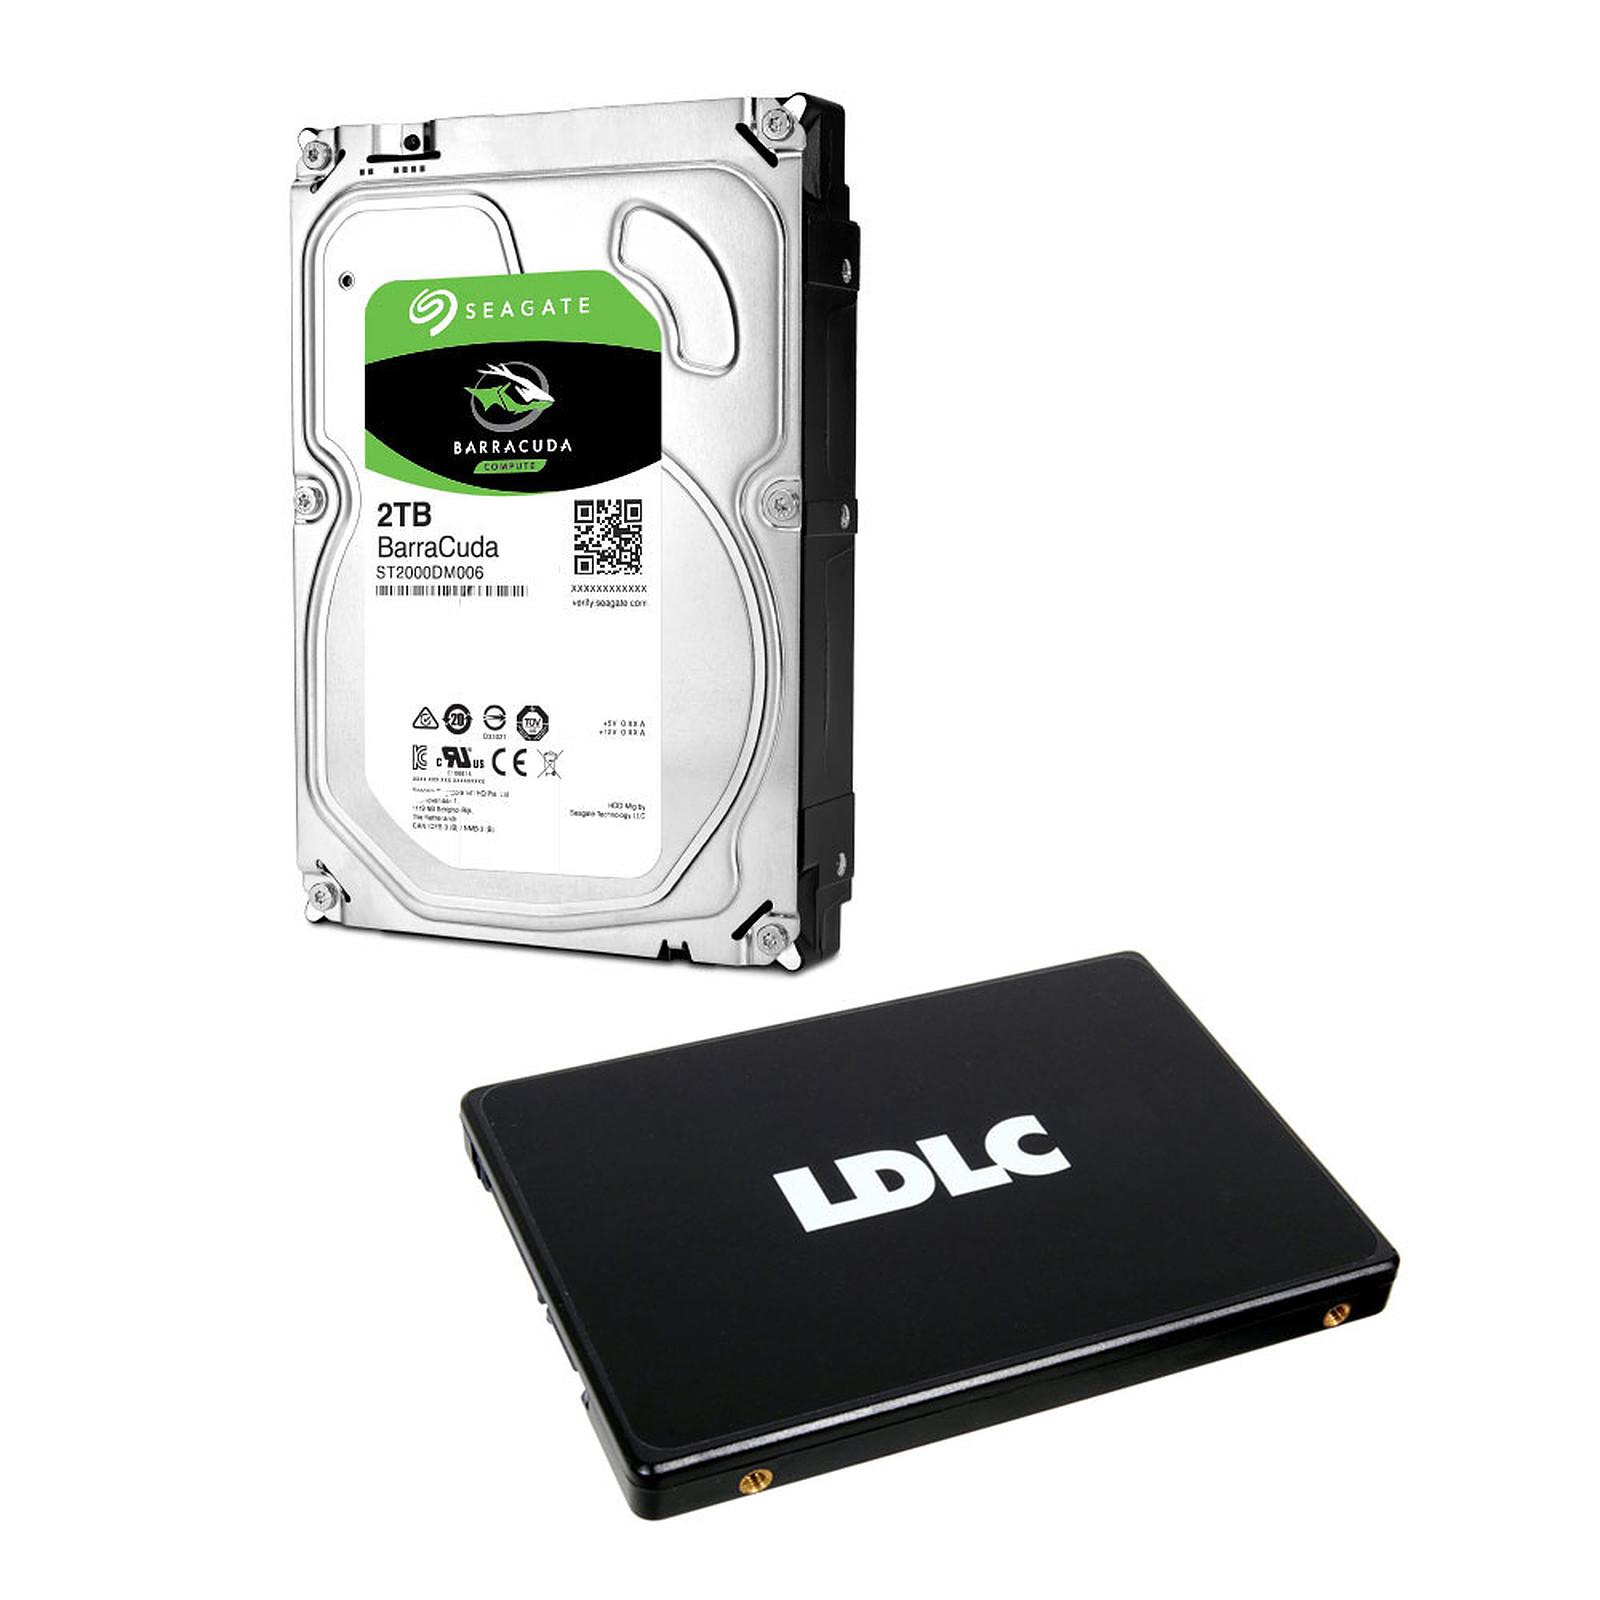 Seagate HDD BarraCuda 2 To + LDLC SSD F7 Plus 120 GB